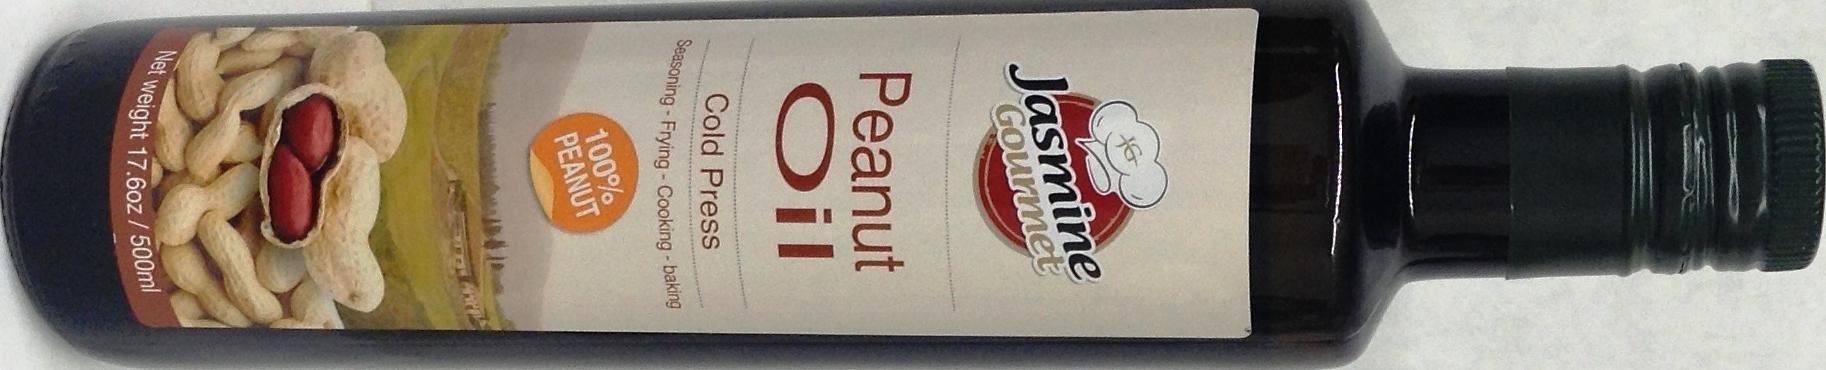 Jasmine Gourmet 100% Peanut Oil Cold Press KFP 17.6 Oz. Pack Of 3. by Jasmine Gourmet